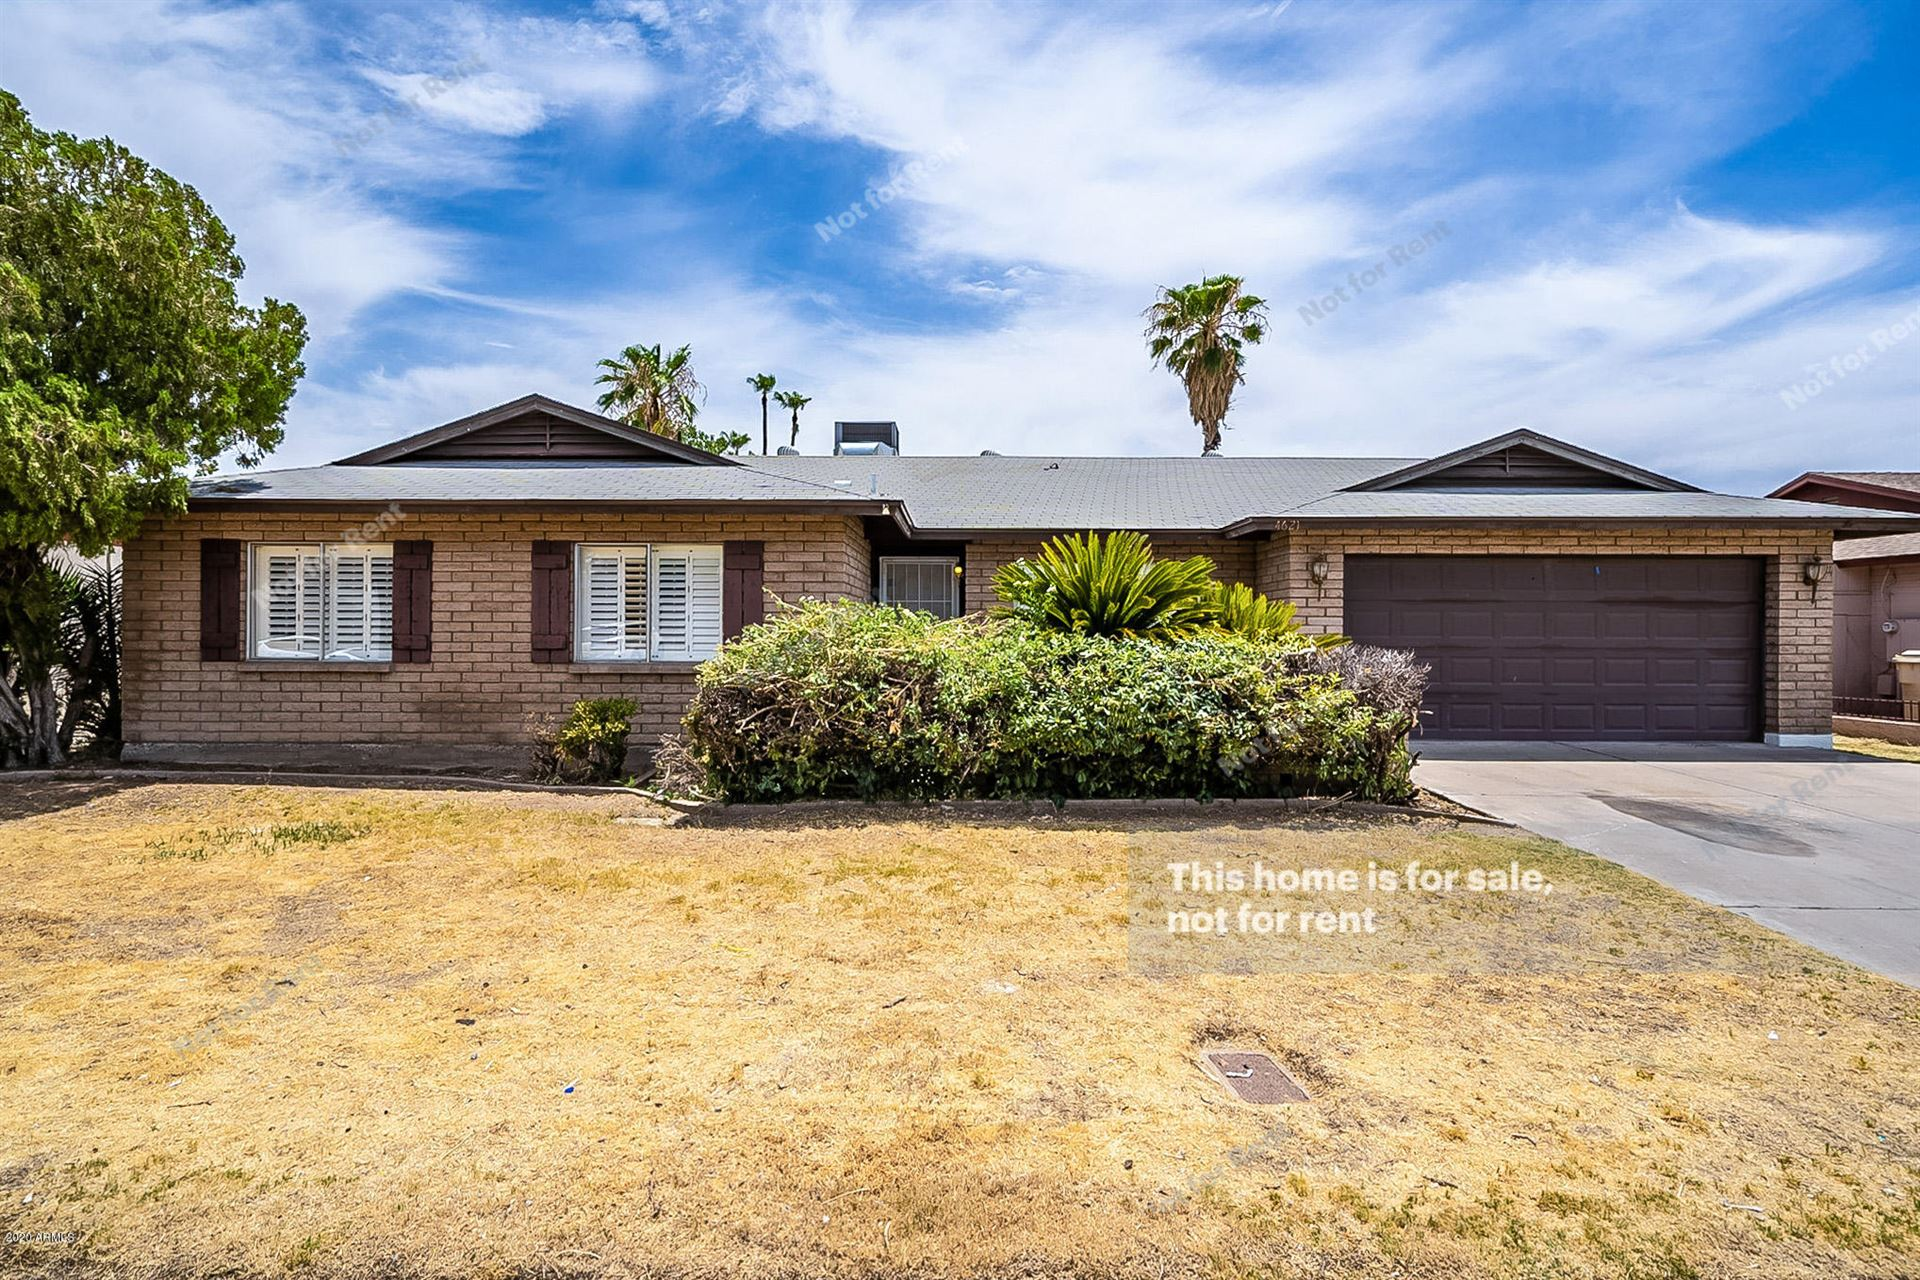 4621 W RUTH Avenue, Glendale, AZ 85302 - #: 6103668